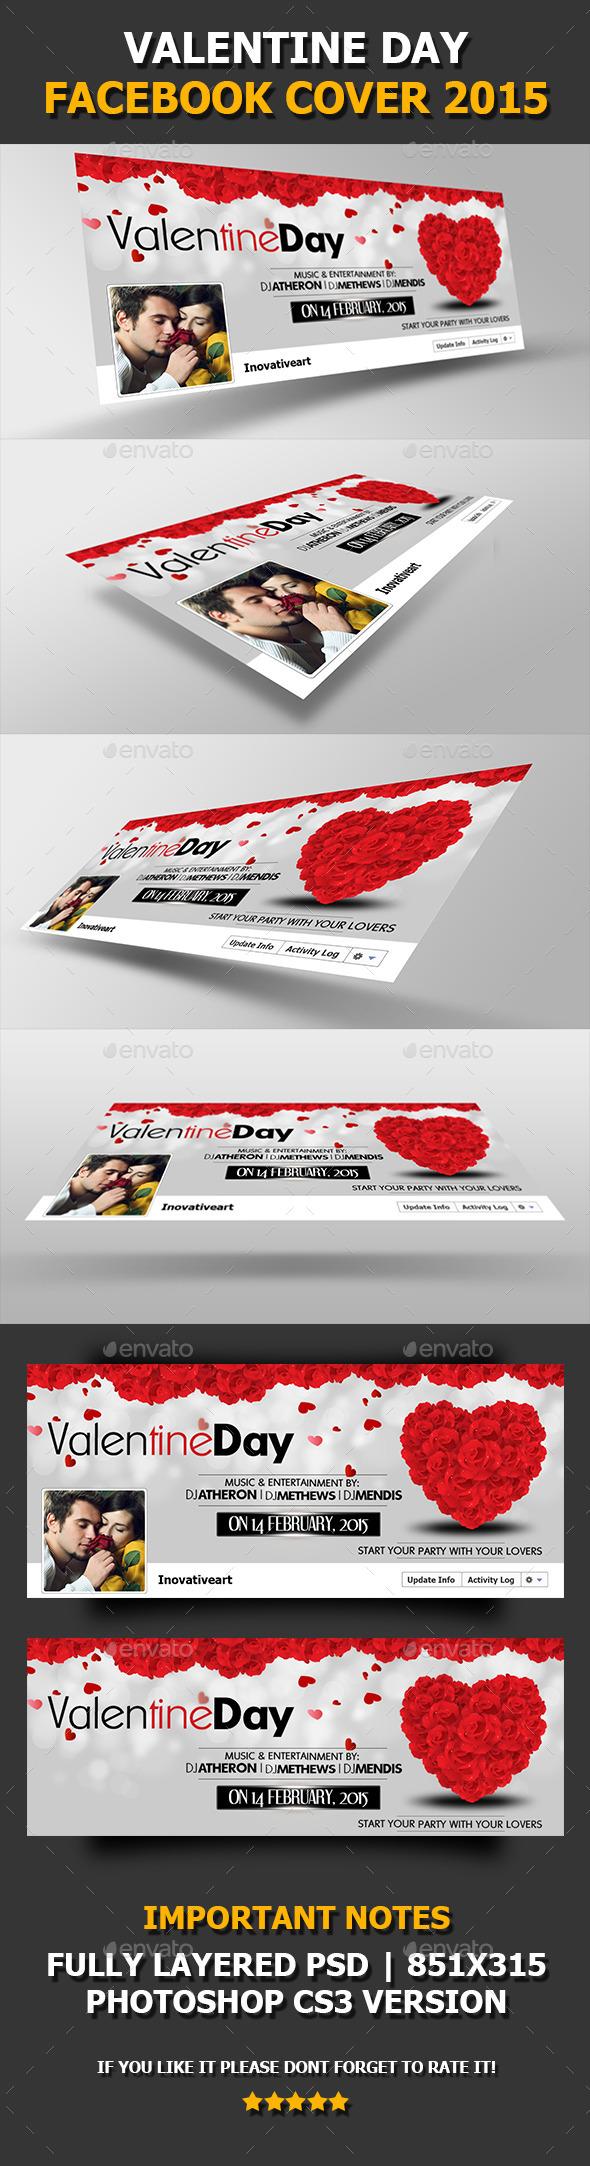 Valentine Day 2015 Facebook Cover V02 -Timeline Cover